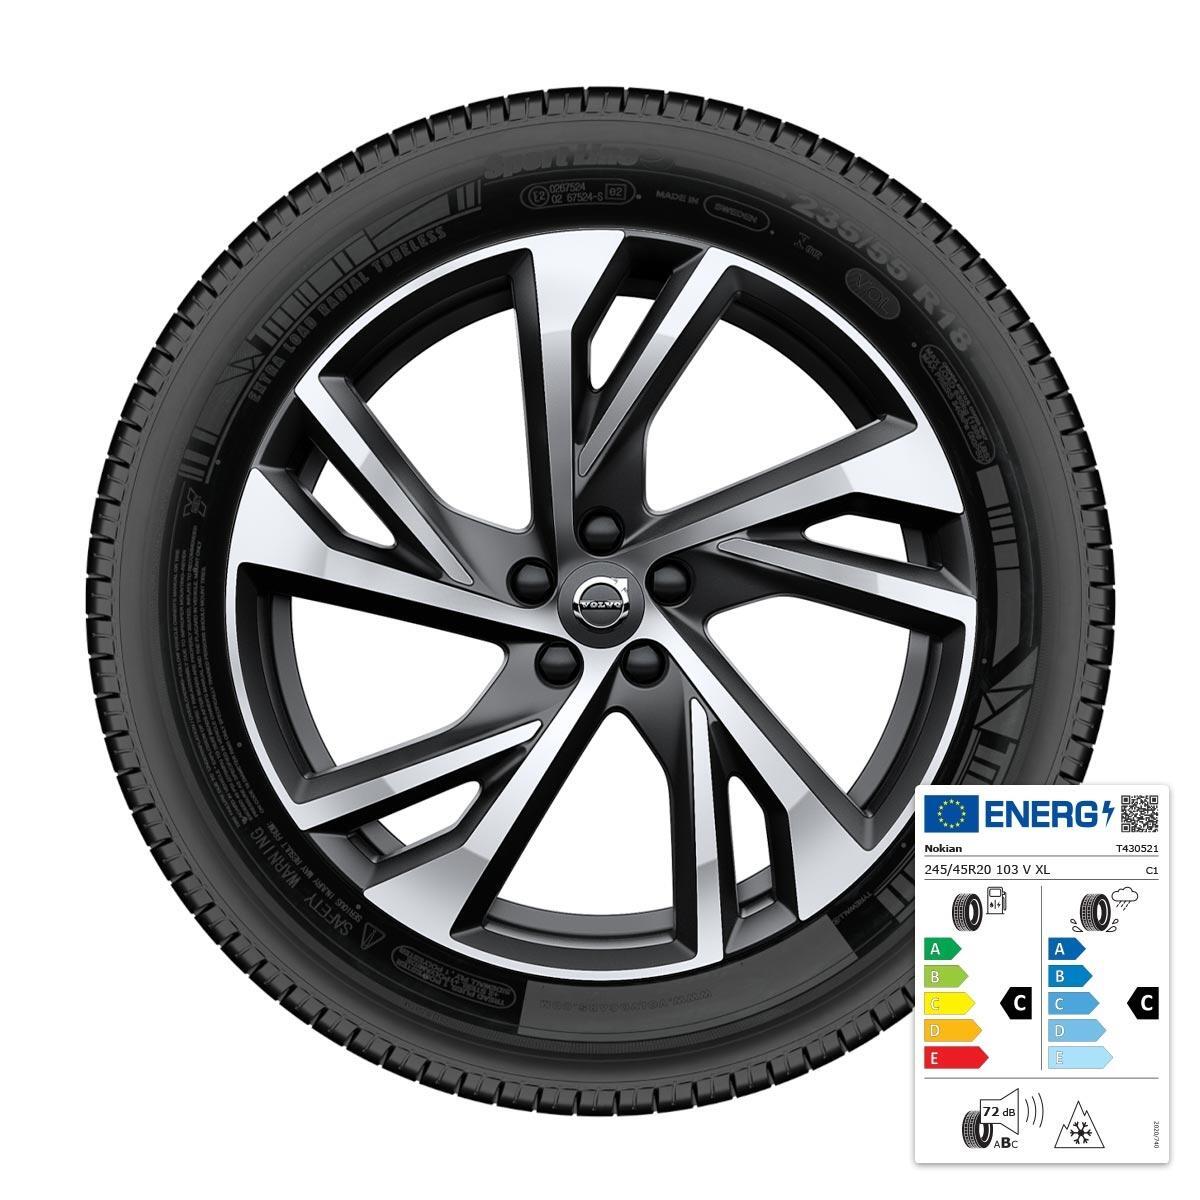 "Komplet zimskih koles: 50,08 cm (20""), pnevmatike Nokian"